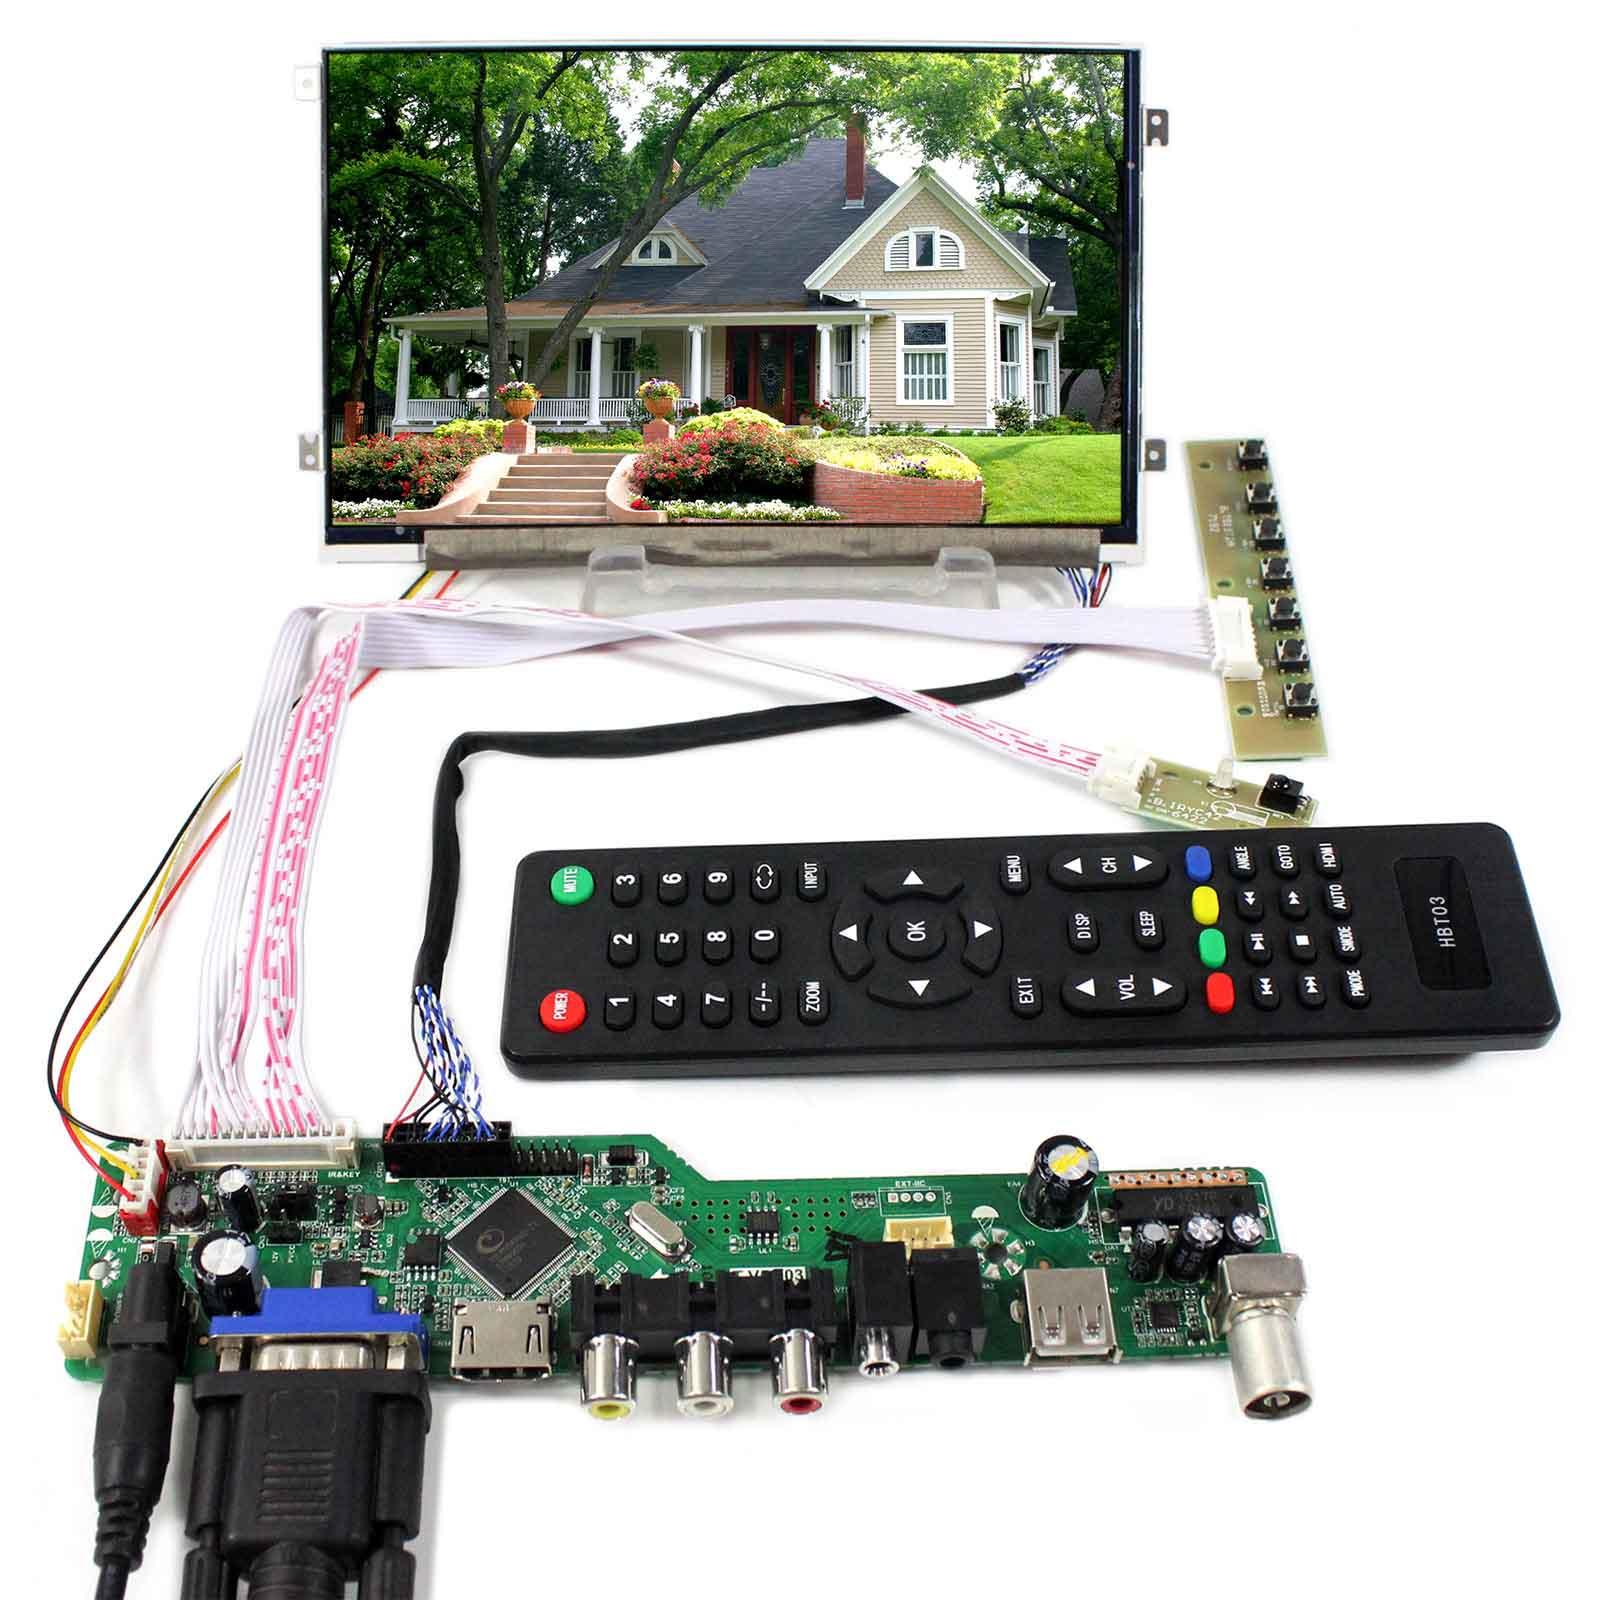 HDMI VGA AV USB RF LCD Controller Board With 7inch 1024x600 HV070WS1-105 LCD ScreenHDMI VGA AV USB RF LCD Controller Board With 7inch 1024x600 HV070WS1-105 LCD Screen